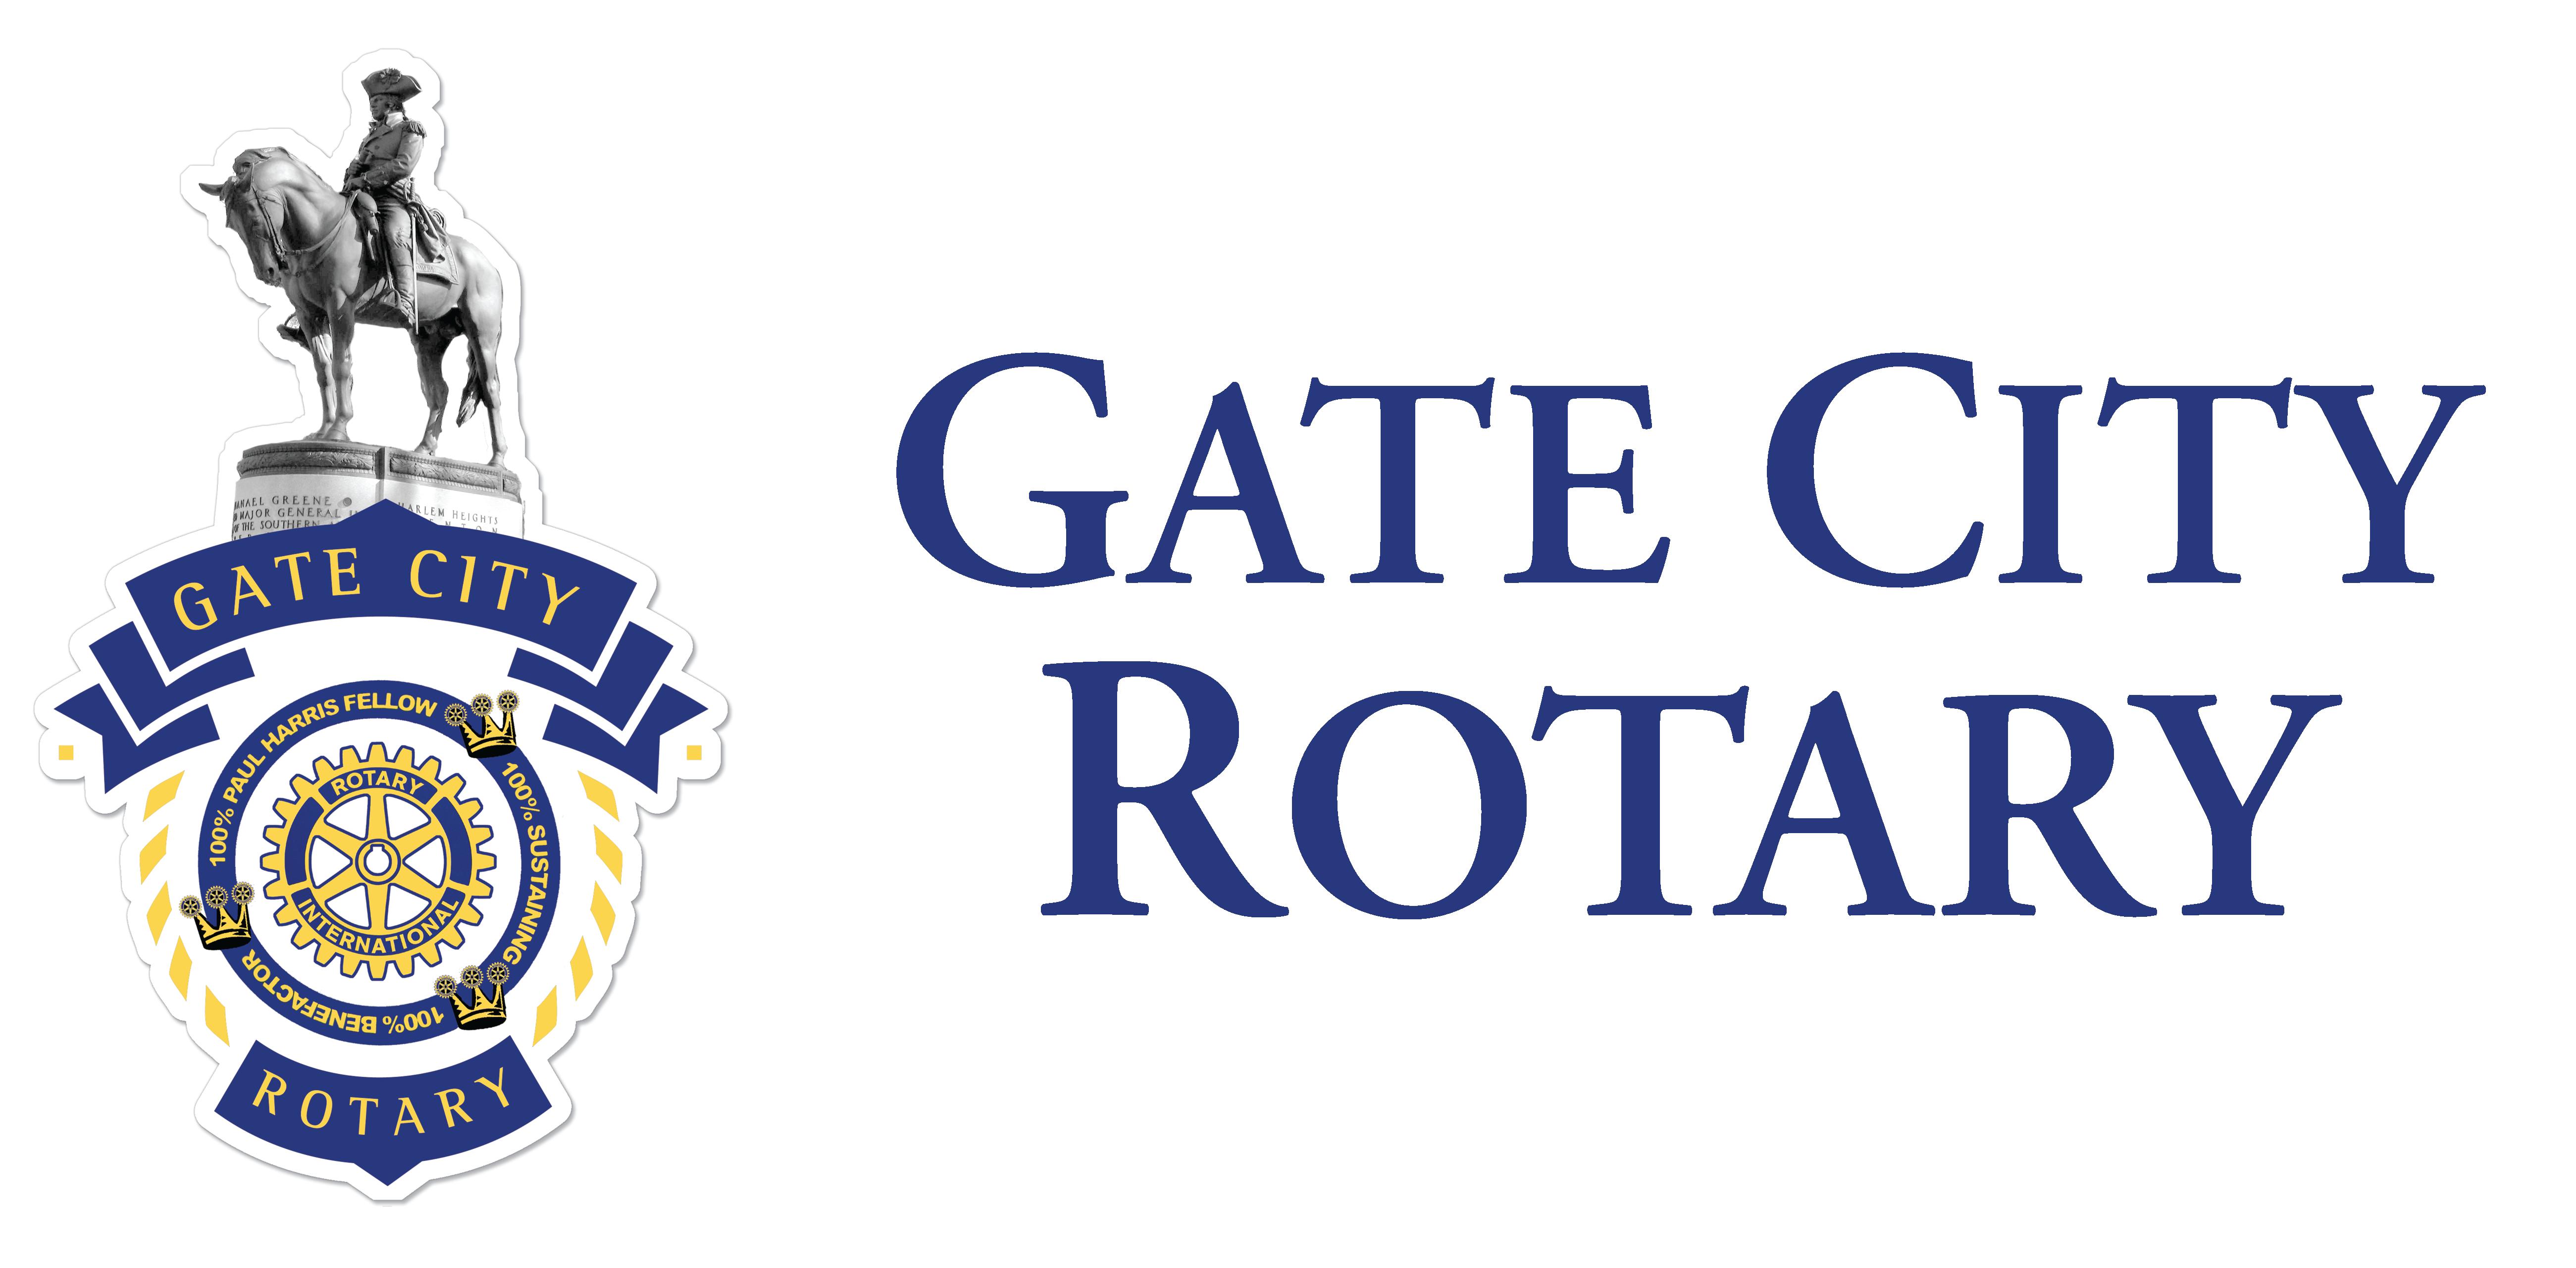 Gate City Rotary